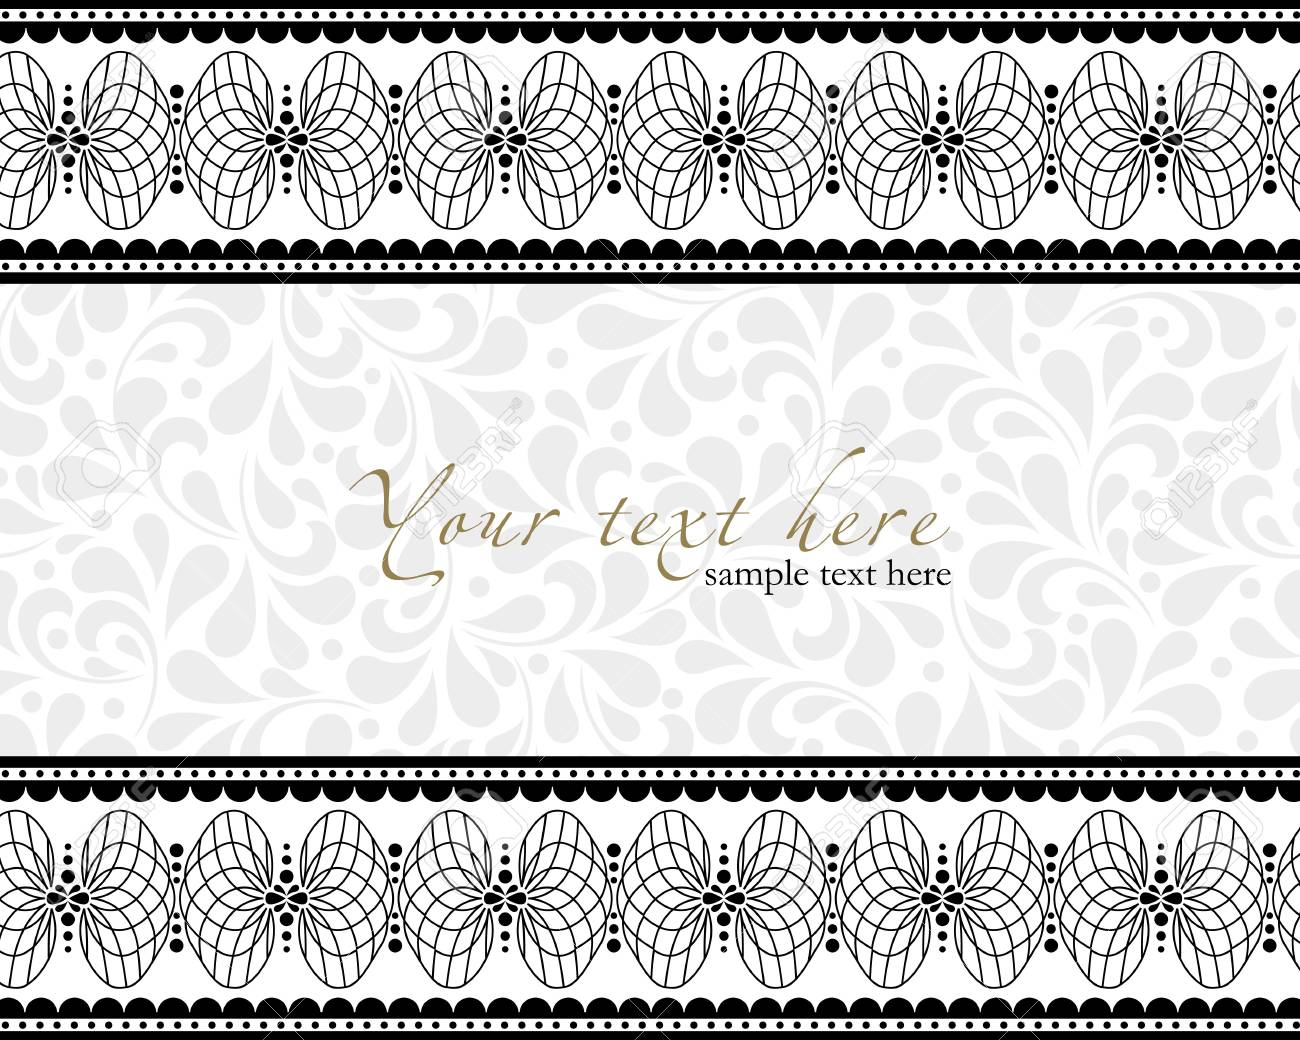 Detailed antique flowers template frame, design for vintage invitation card. Stock Vector - 24094735